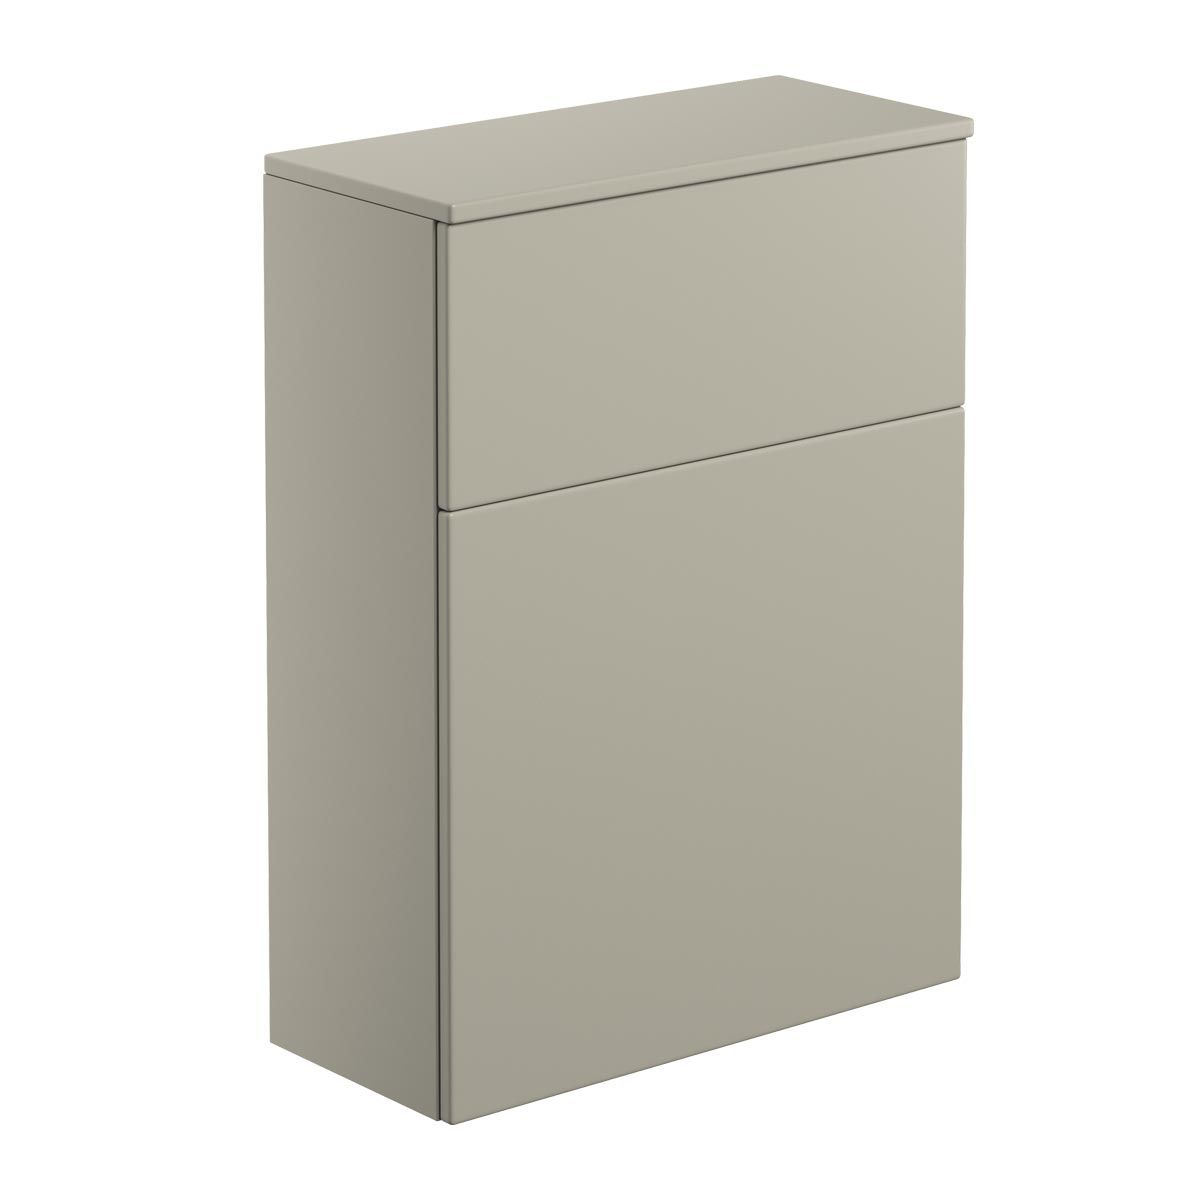 BTL Carino Latte Floor Standing WC Toilet Unit 600mm